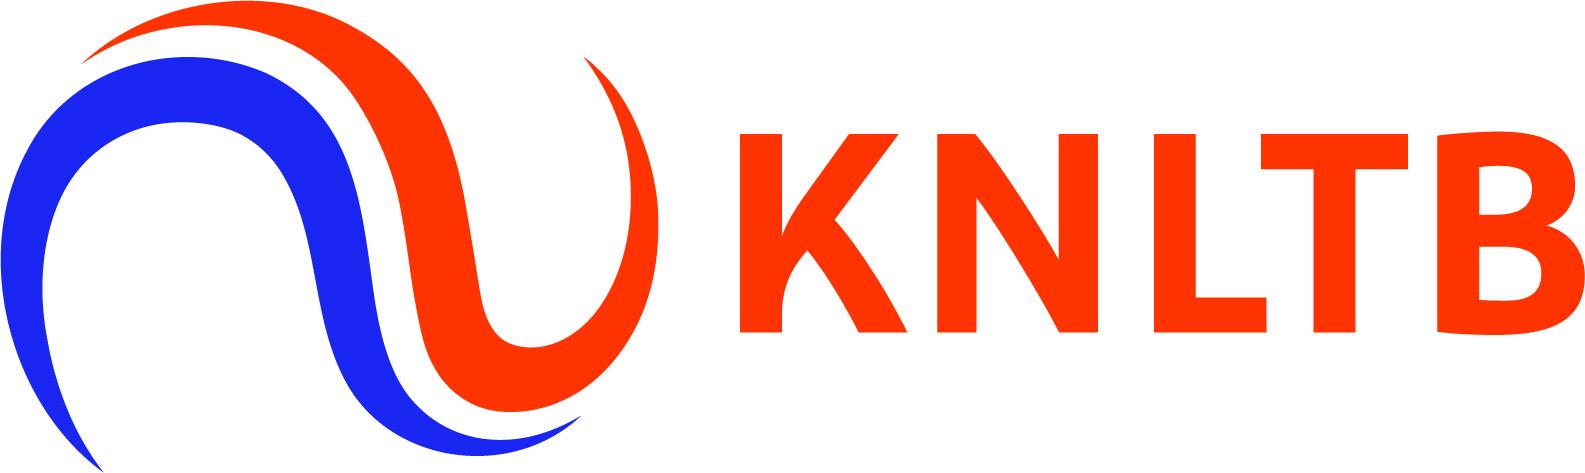 KNLTB en Sport Medisch Centrum Papendal werken samen